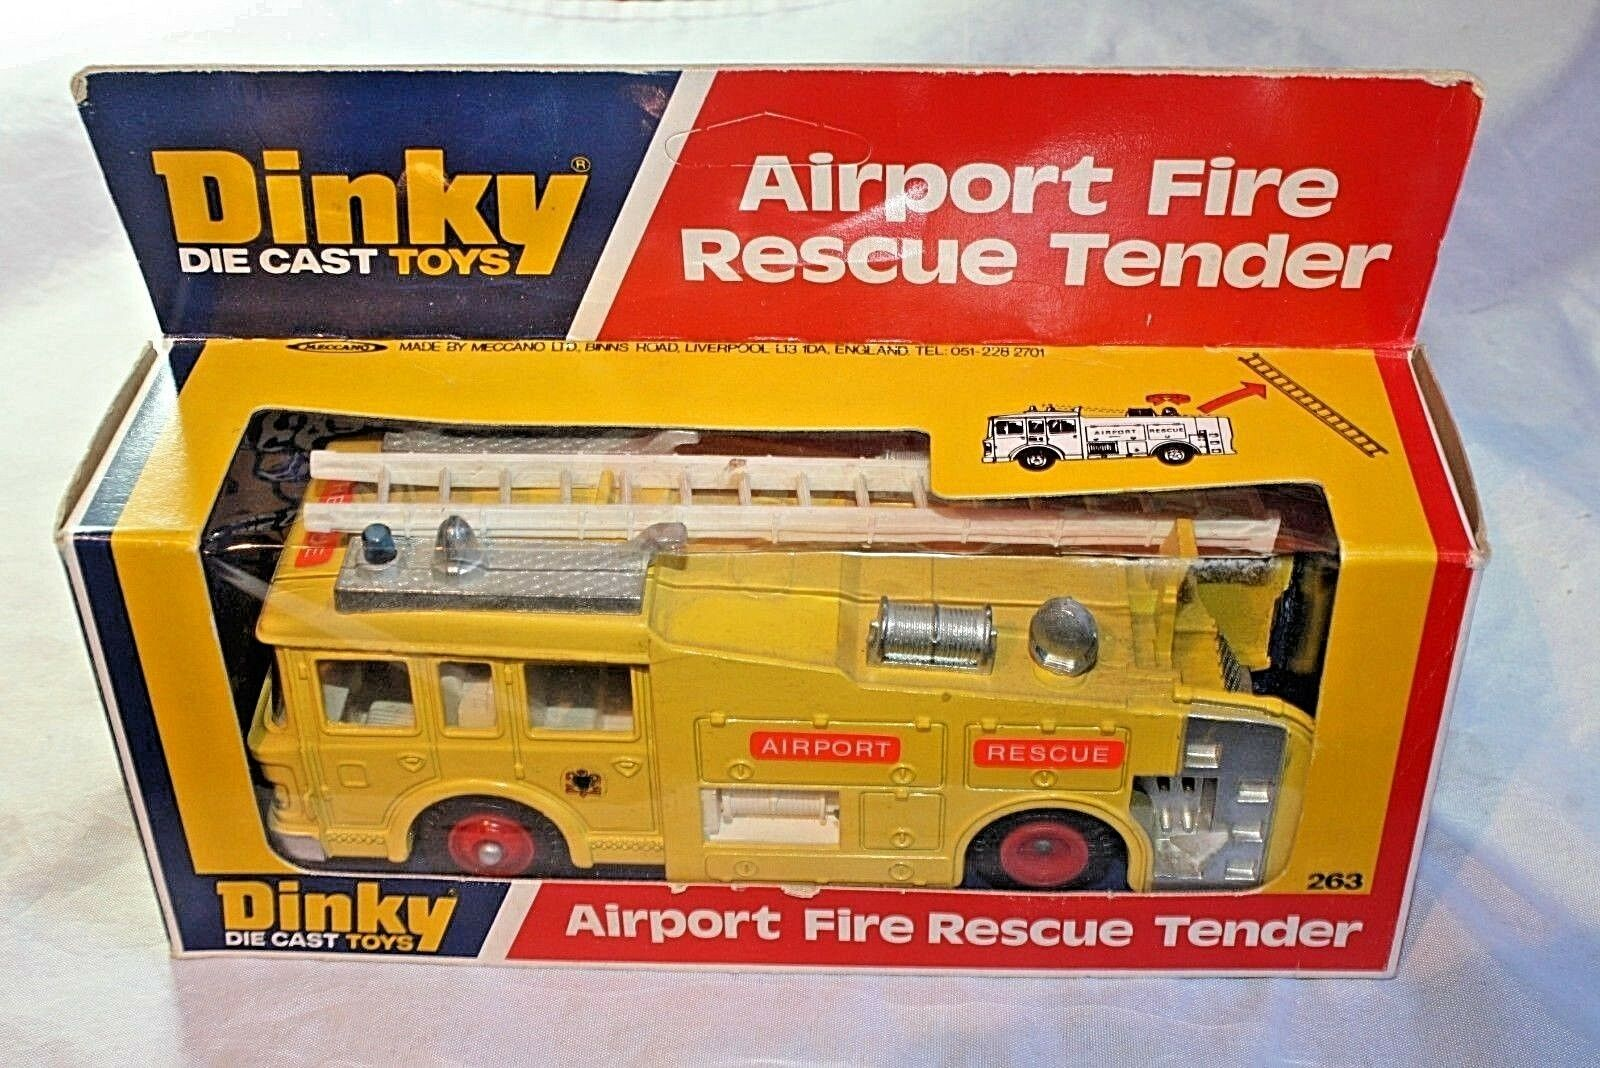 Dinky 263 Airport Fire Rescue licitación, Menta en Caja Original Excelente